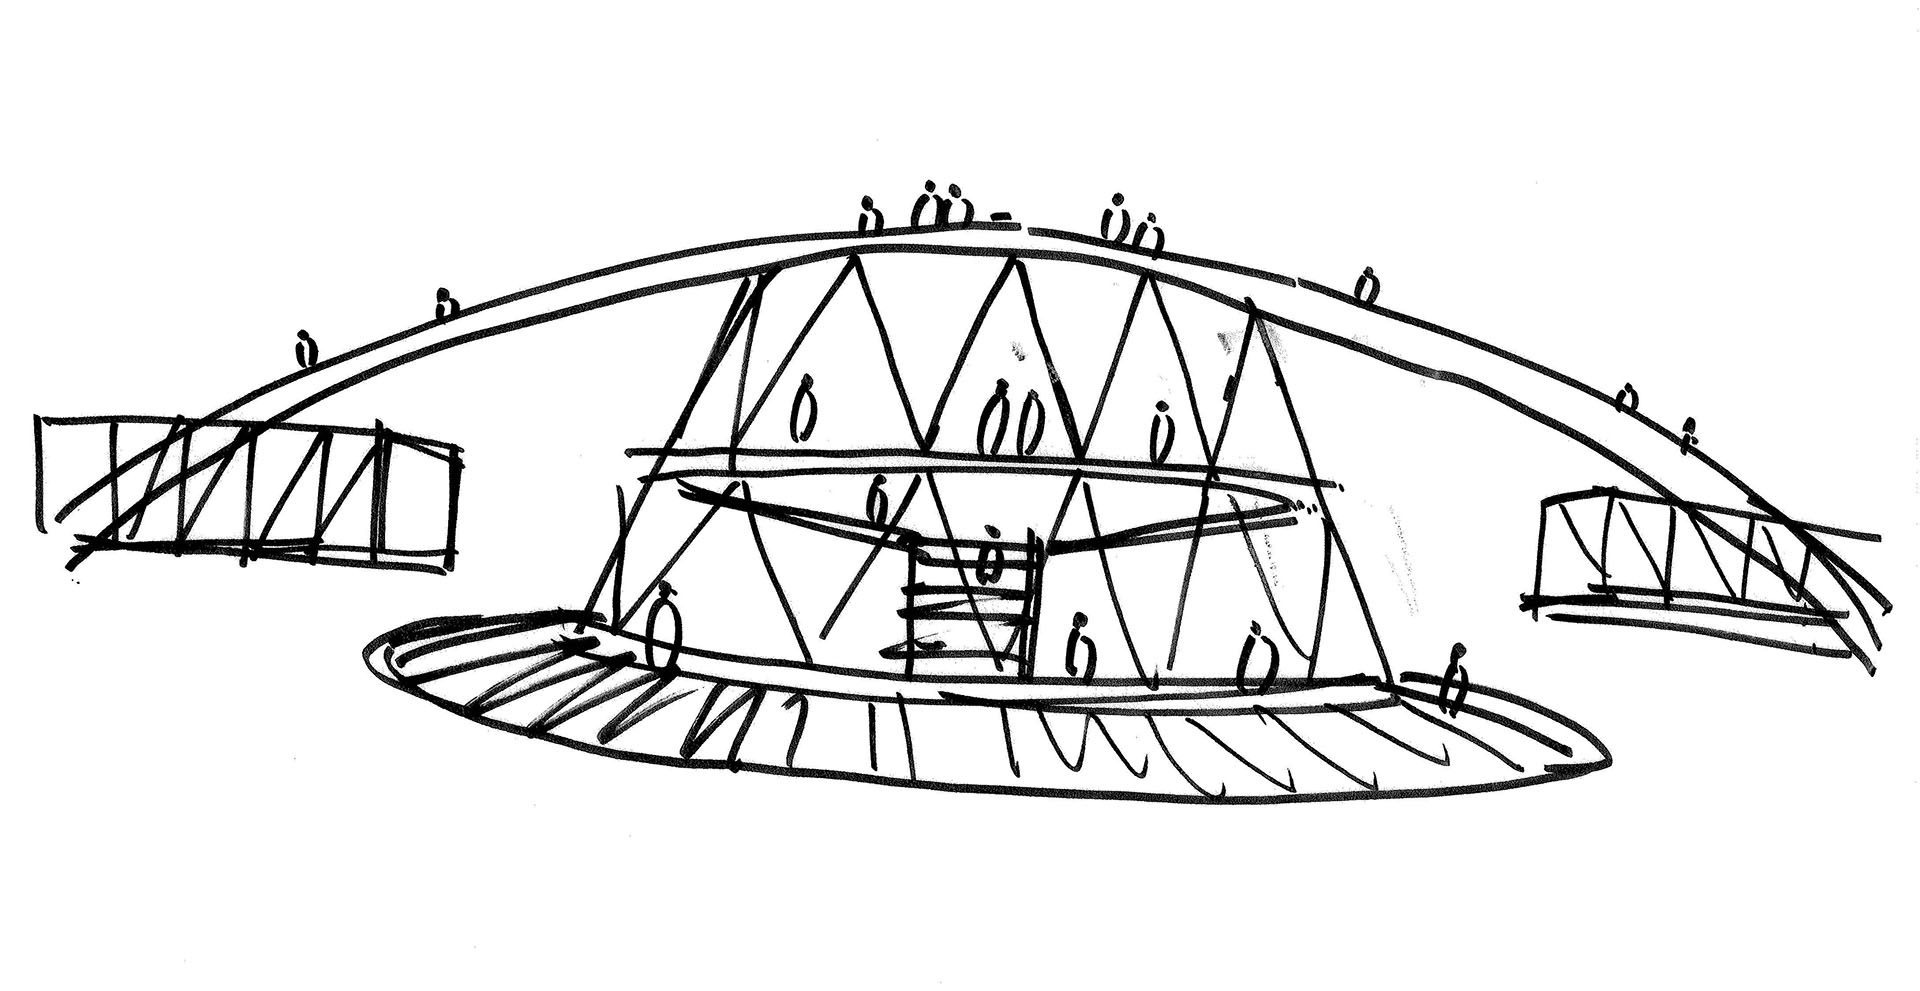 NABC_Sketch